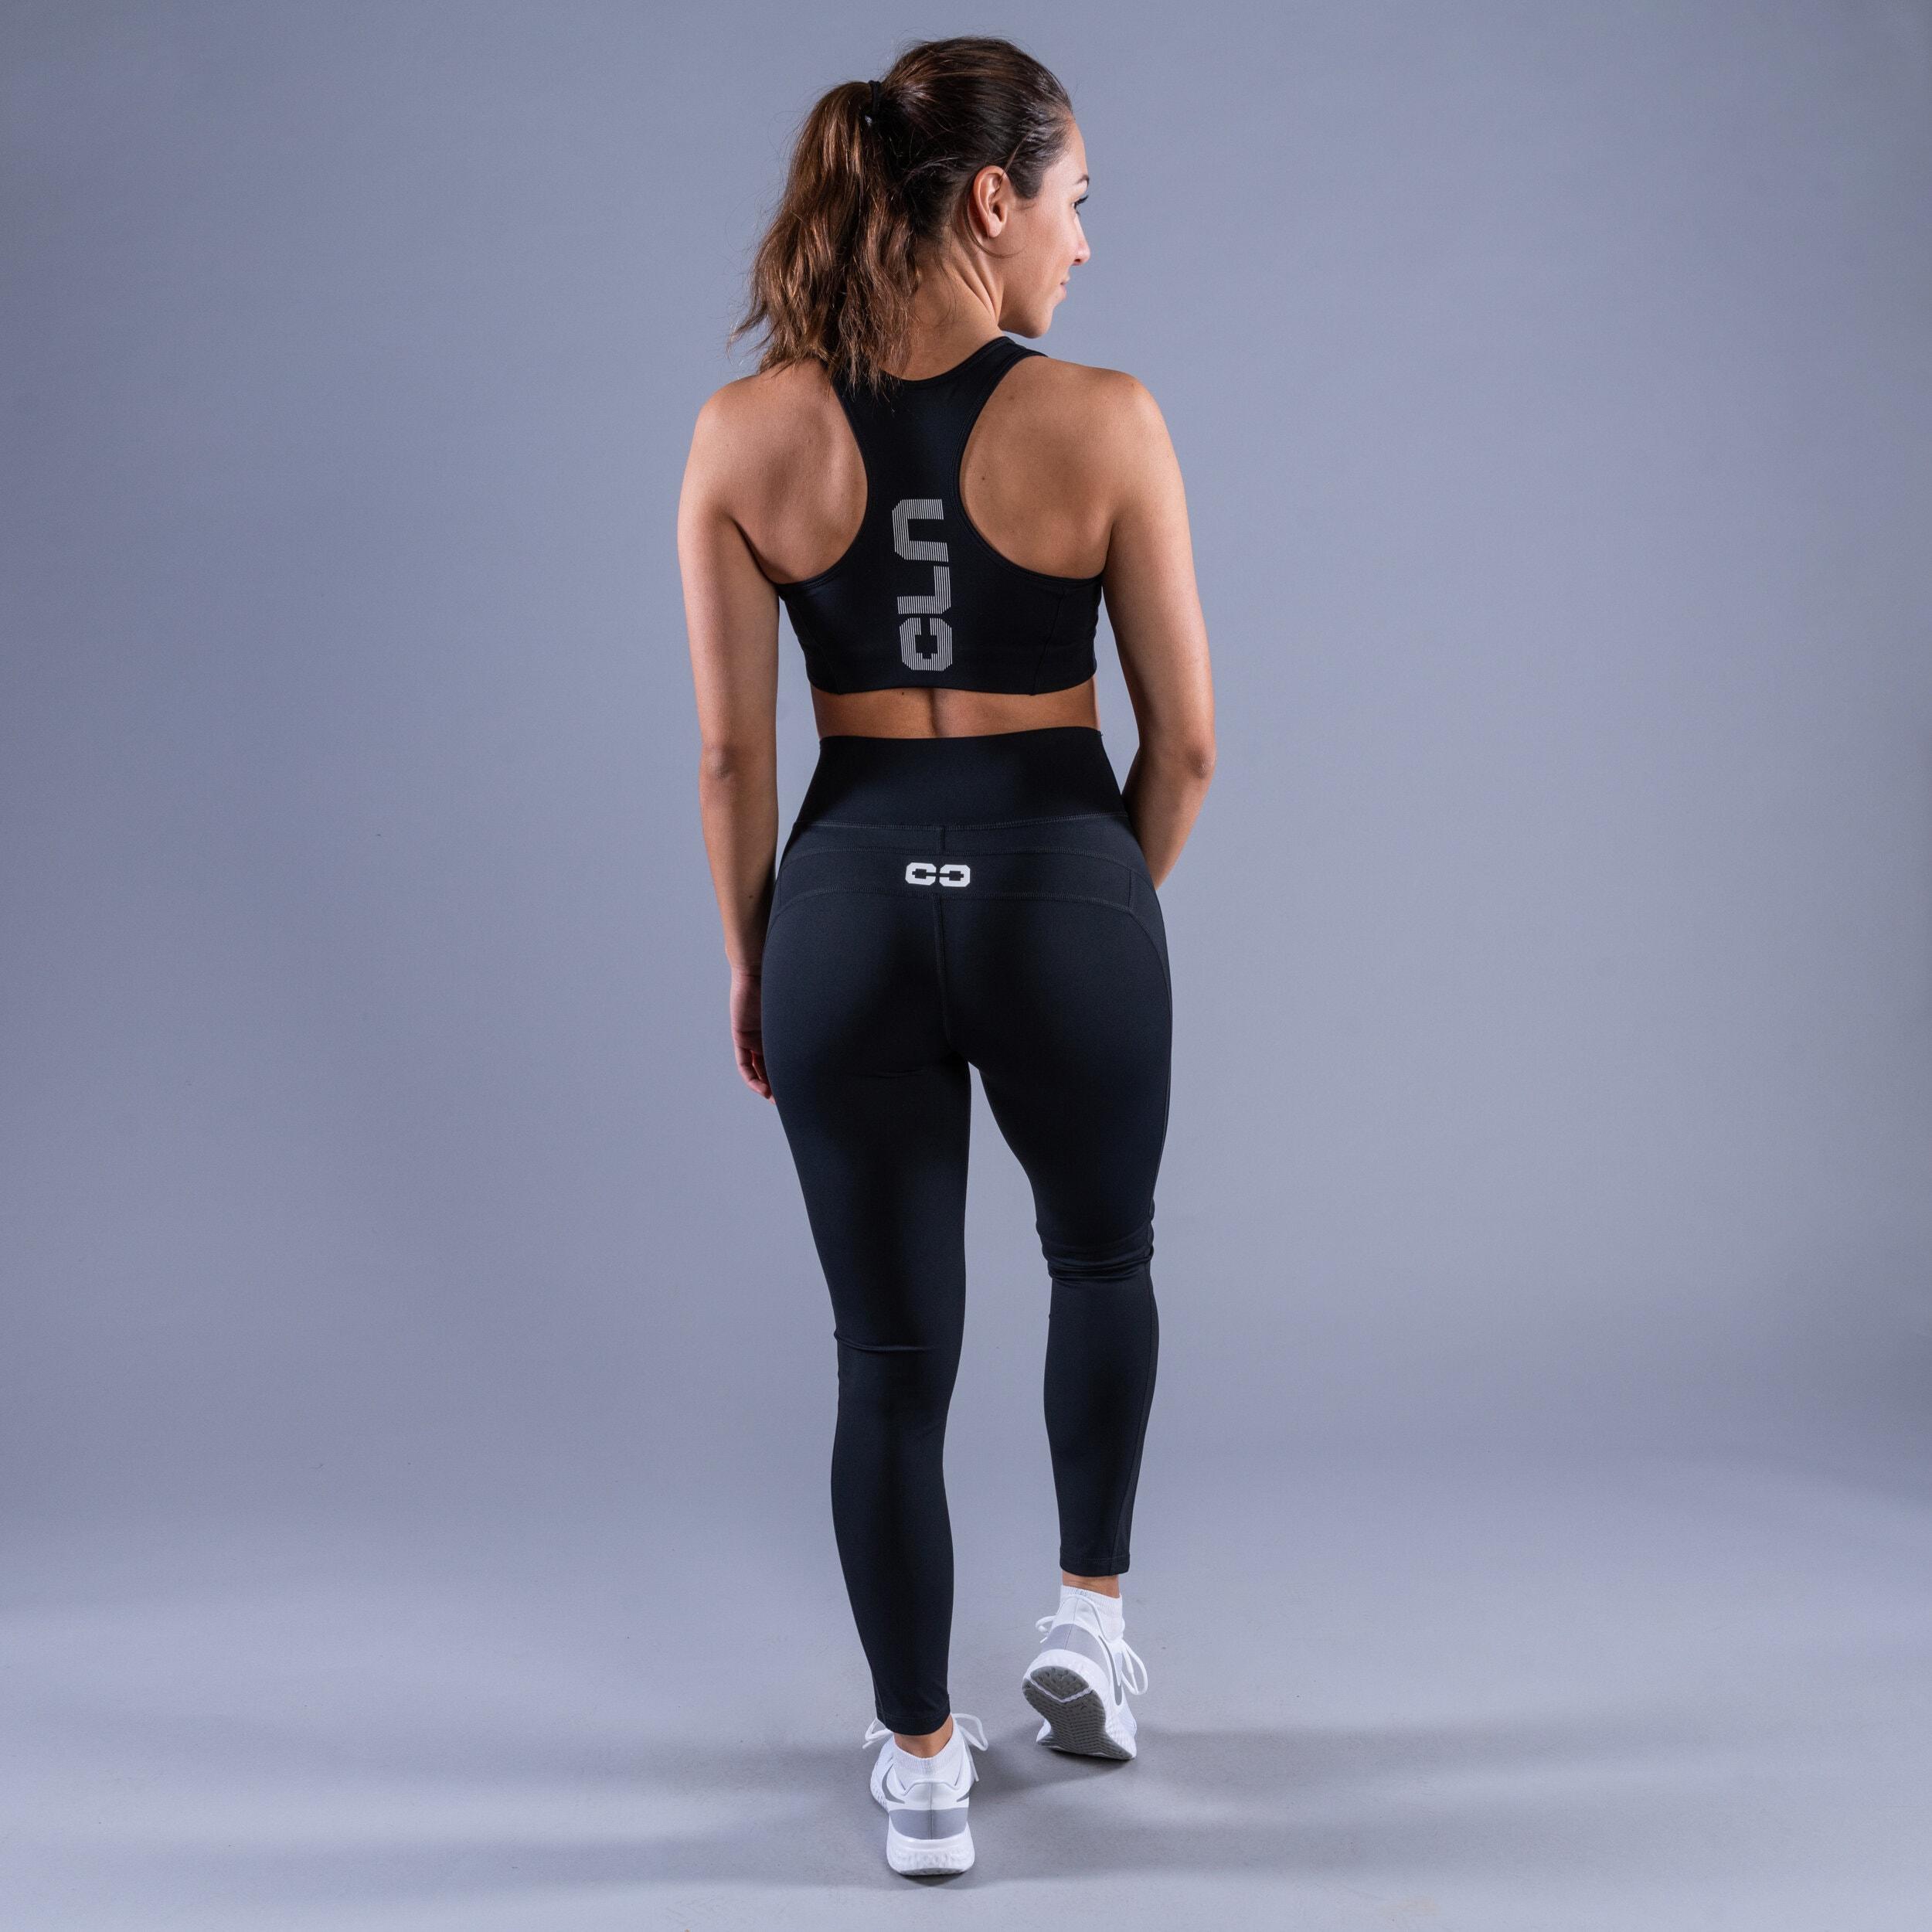 Omni tights - Intense sport bra Package Black